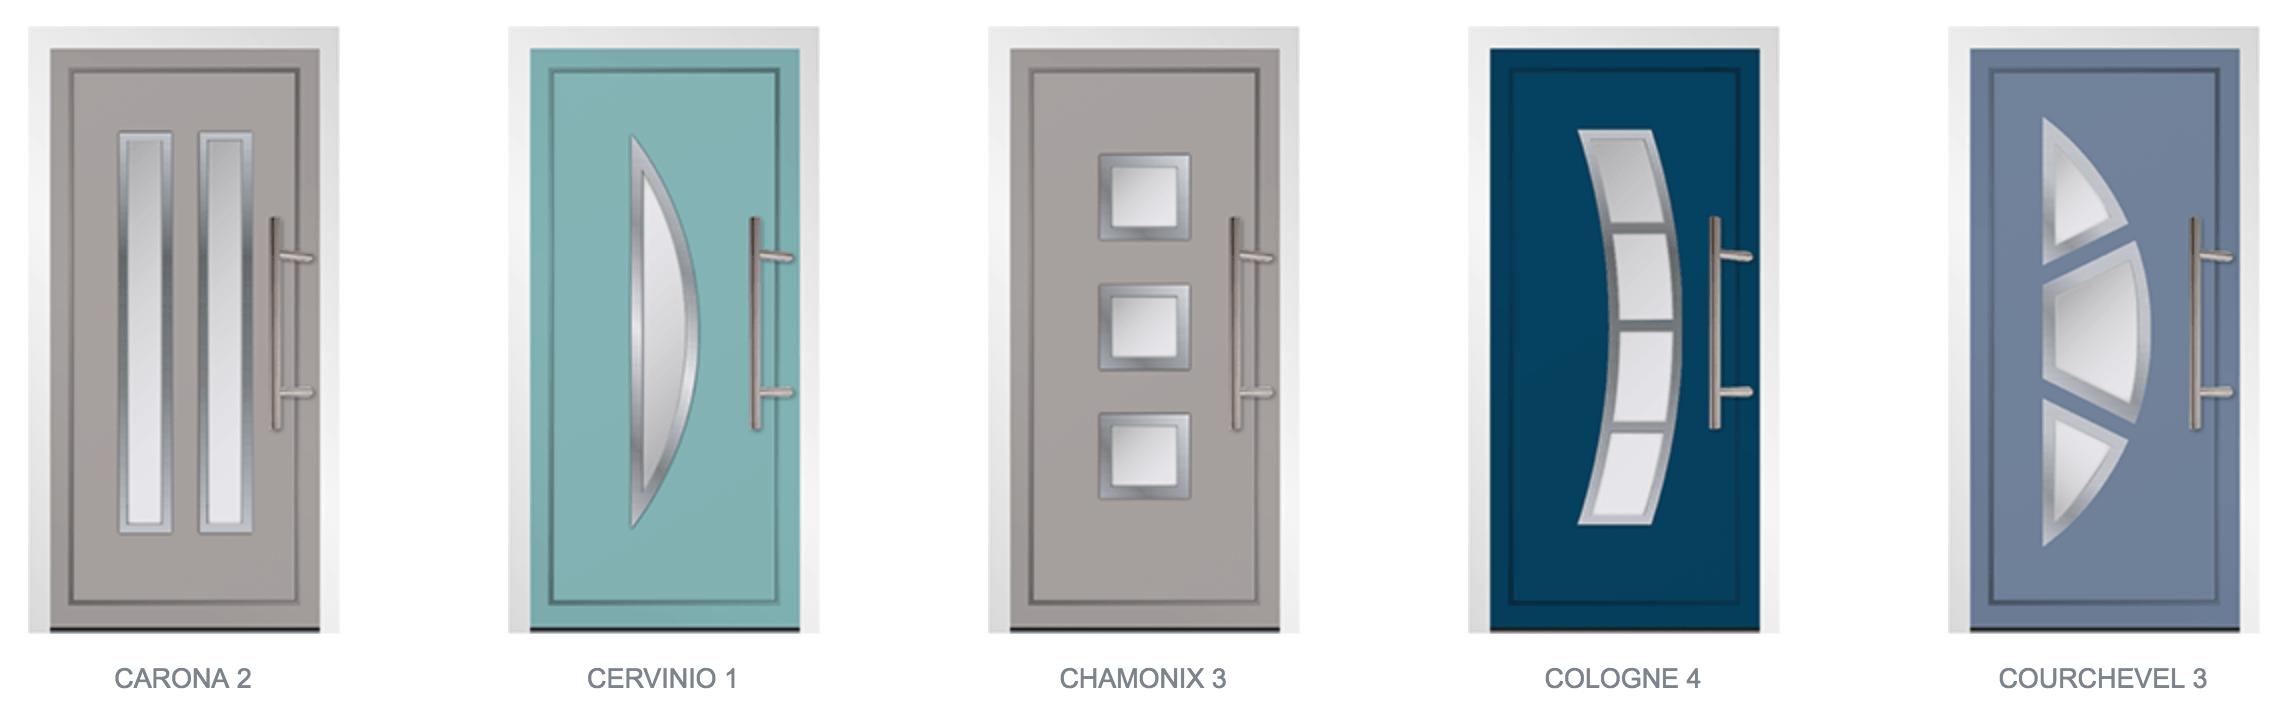 Aluminium Door Styles03